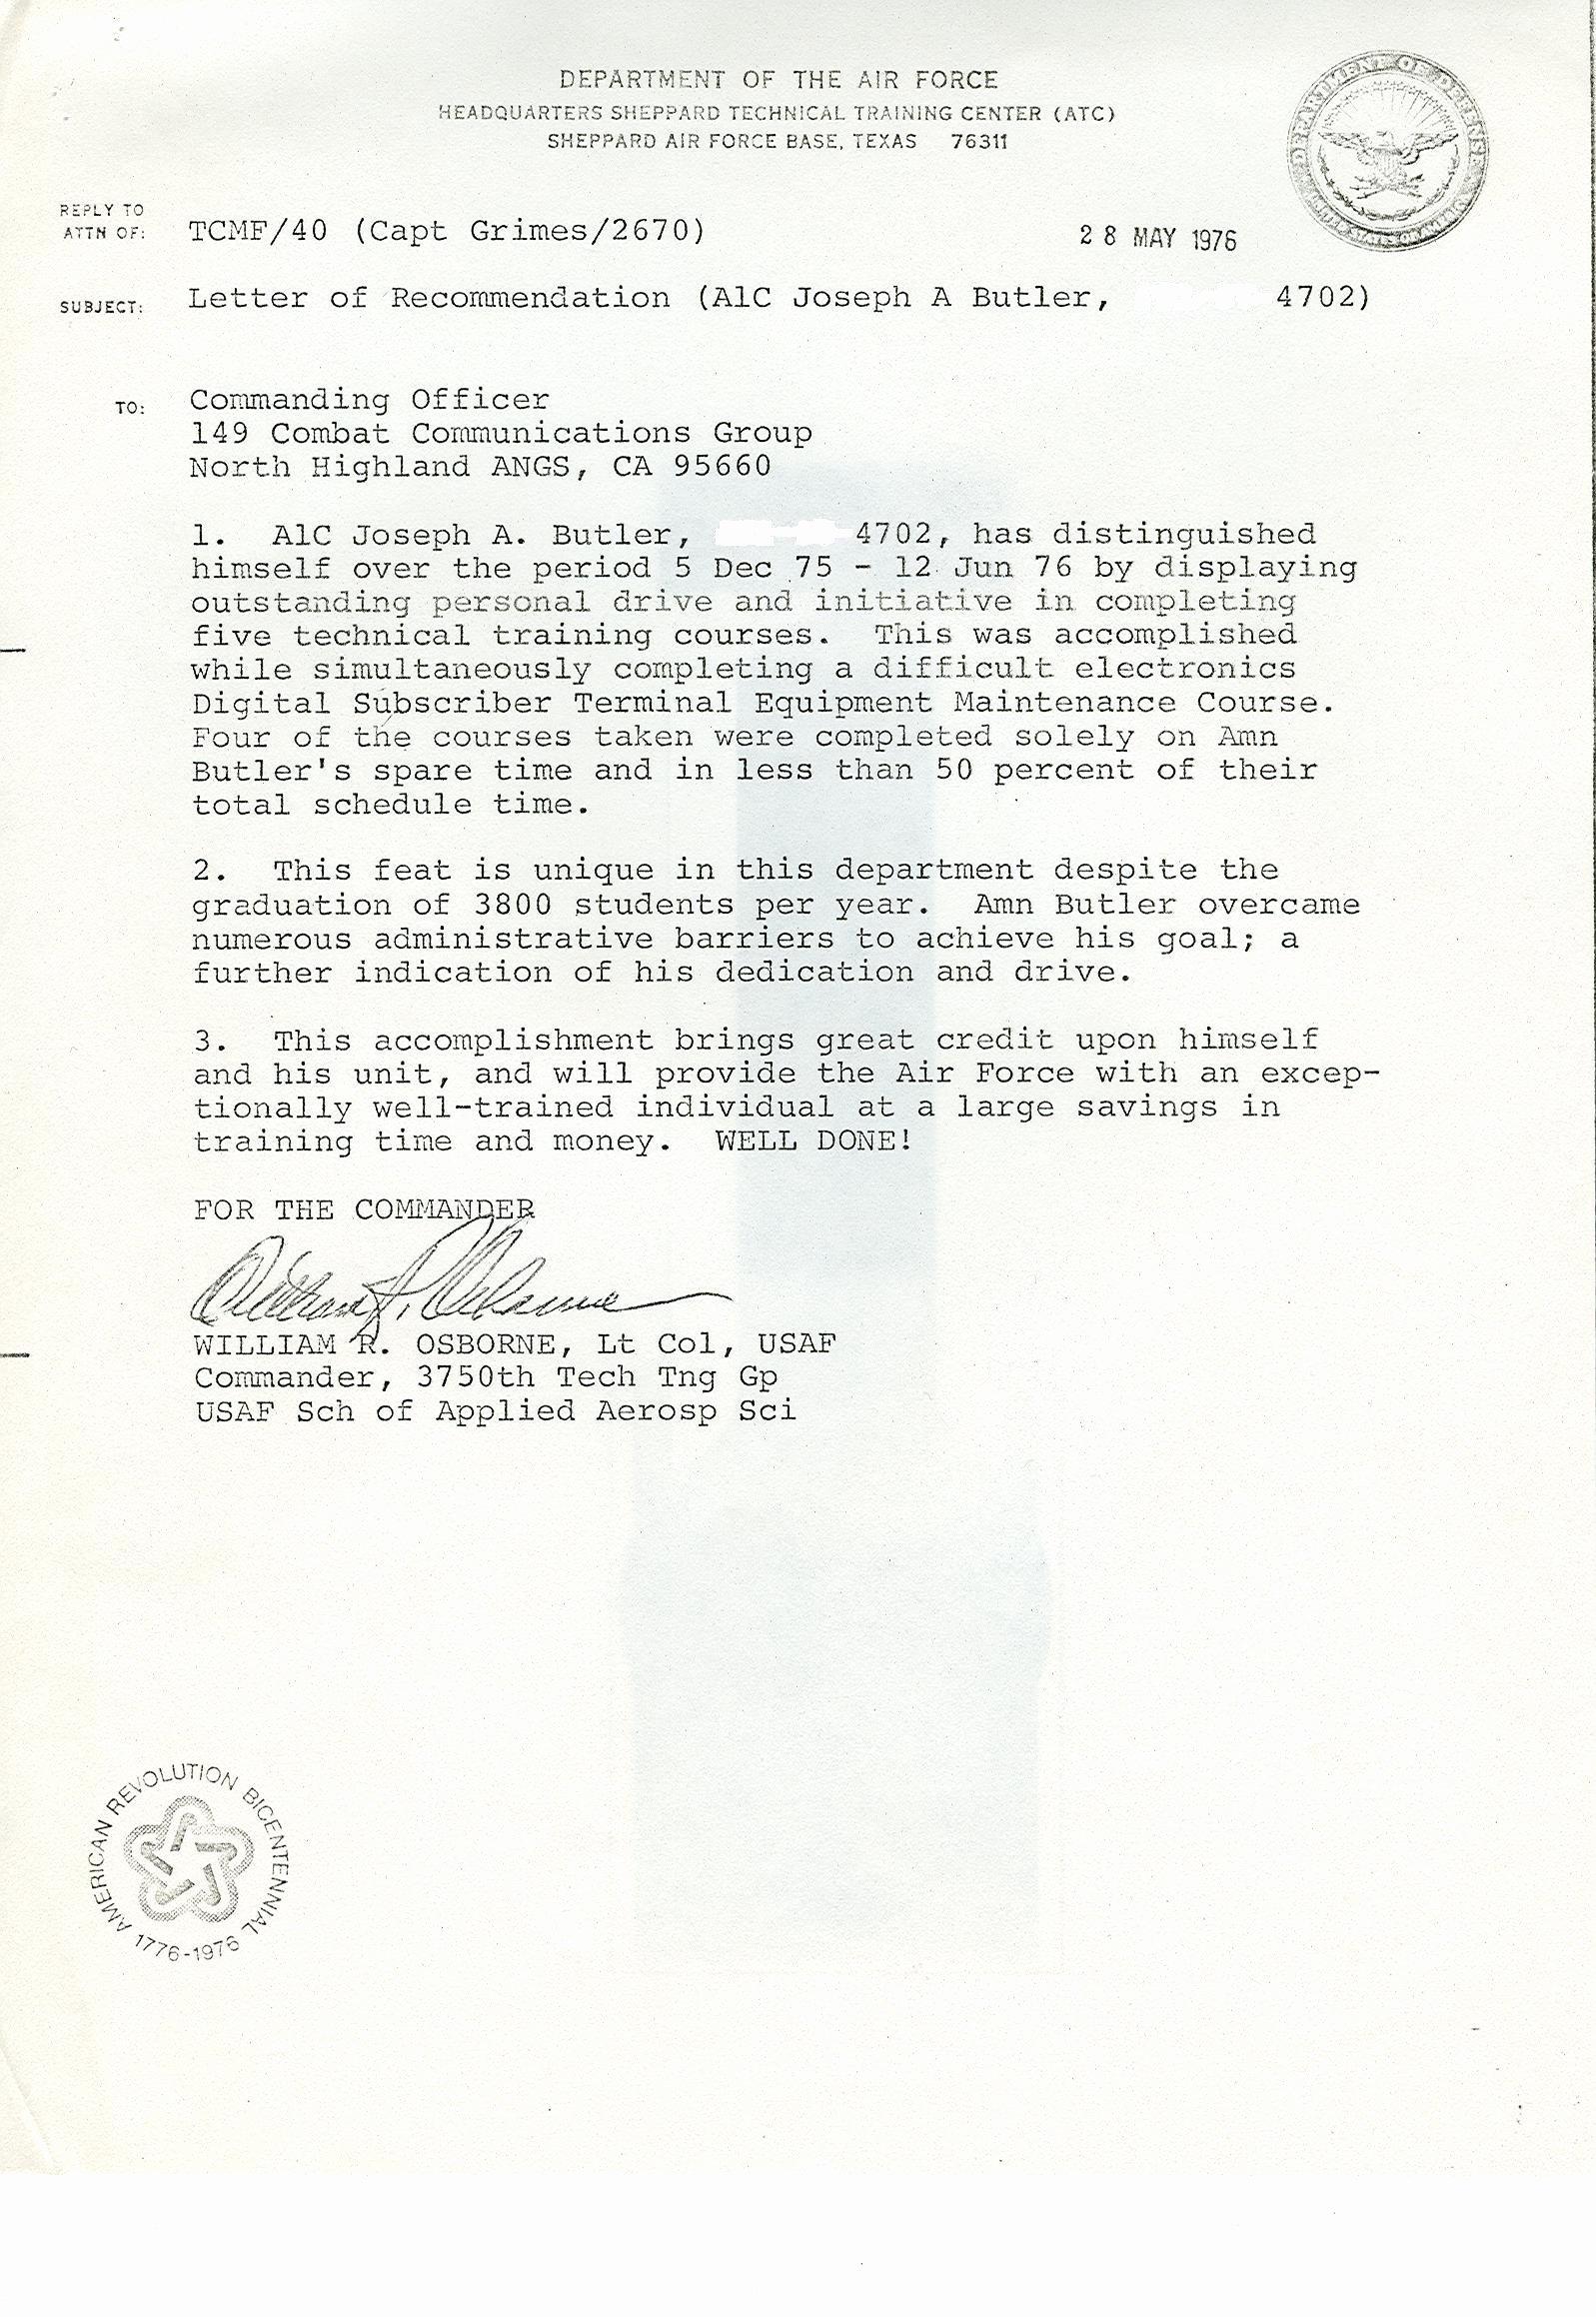 Military Letter Of Recommendation Elegant Military Letter Of Re Mendation